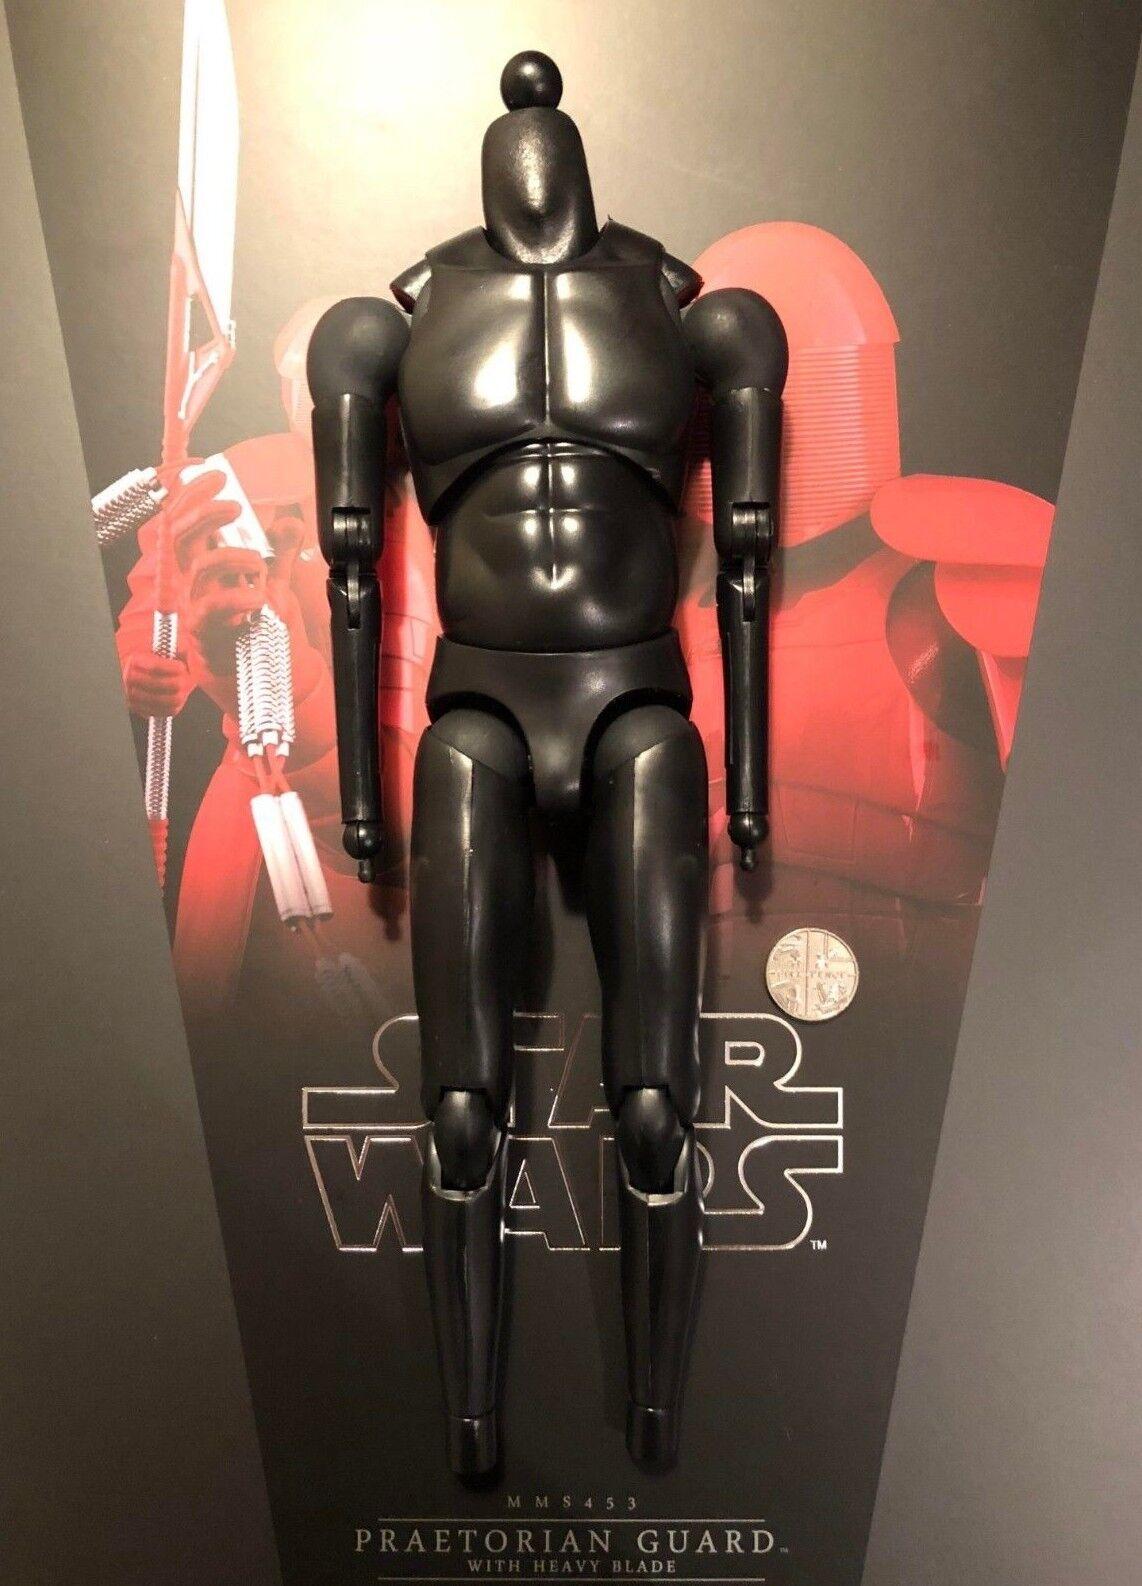 Hot Toys Star Wars prétorienne Garde HB Nude Body loose échelle 1 6th